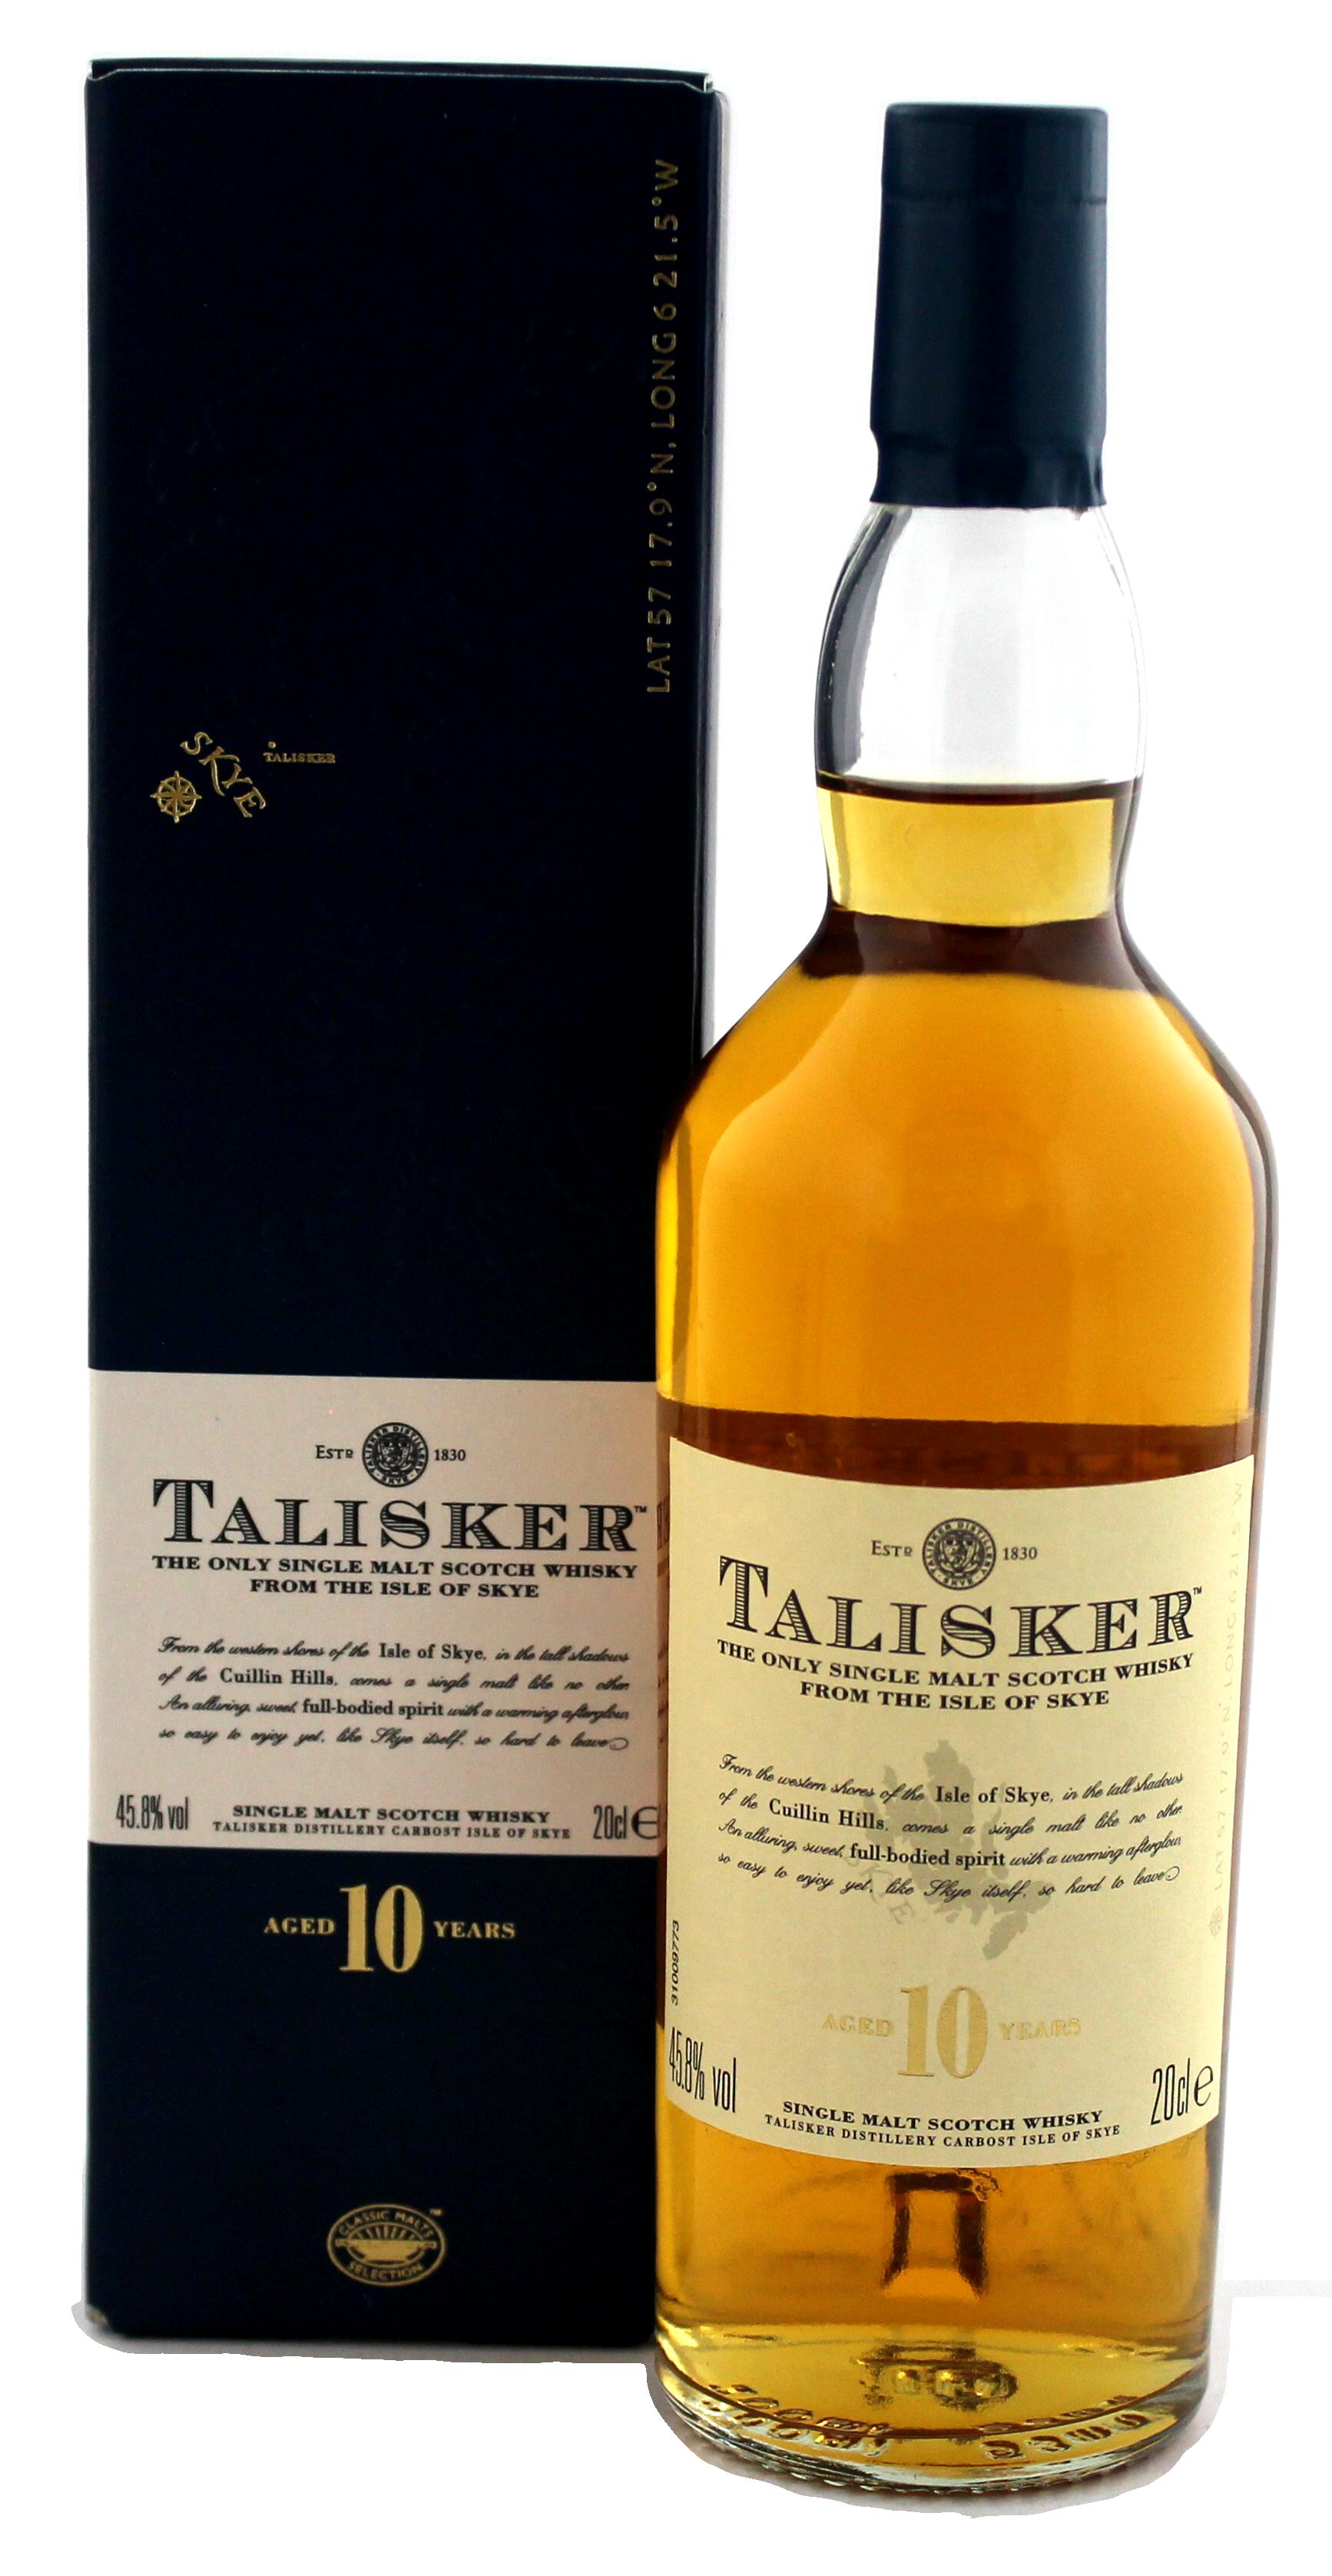 talisker malt whisky 10 jahre kaufen whisky online shop spirituosen. Black Bedroom Furniture Sets. Home Design Ideas